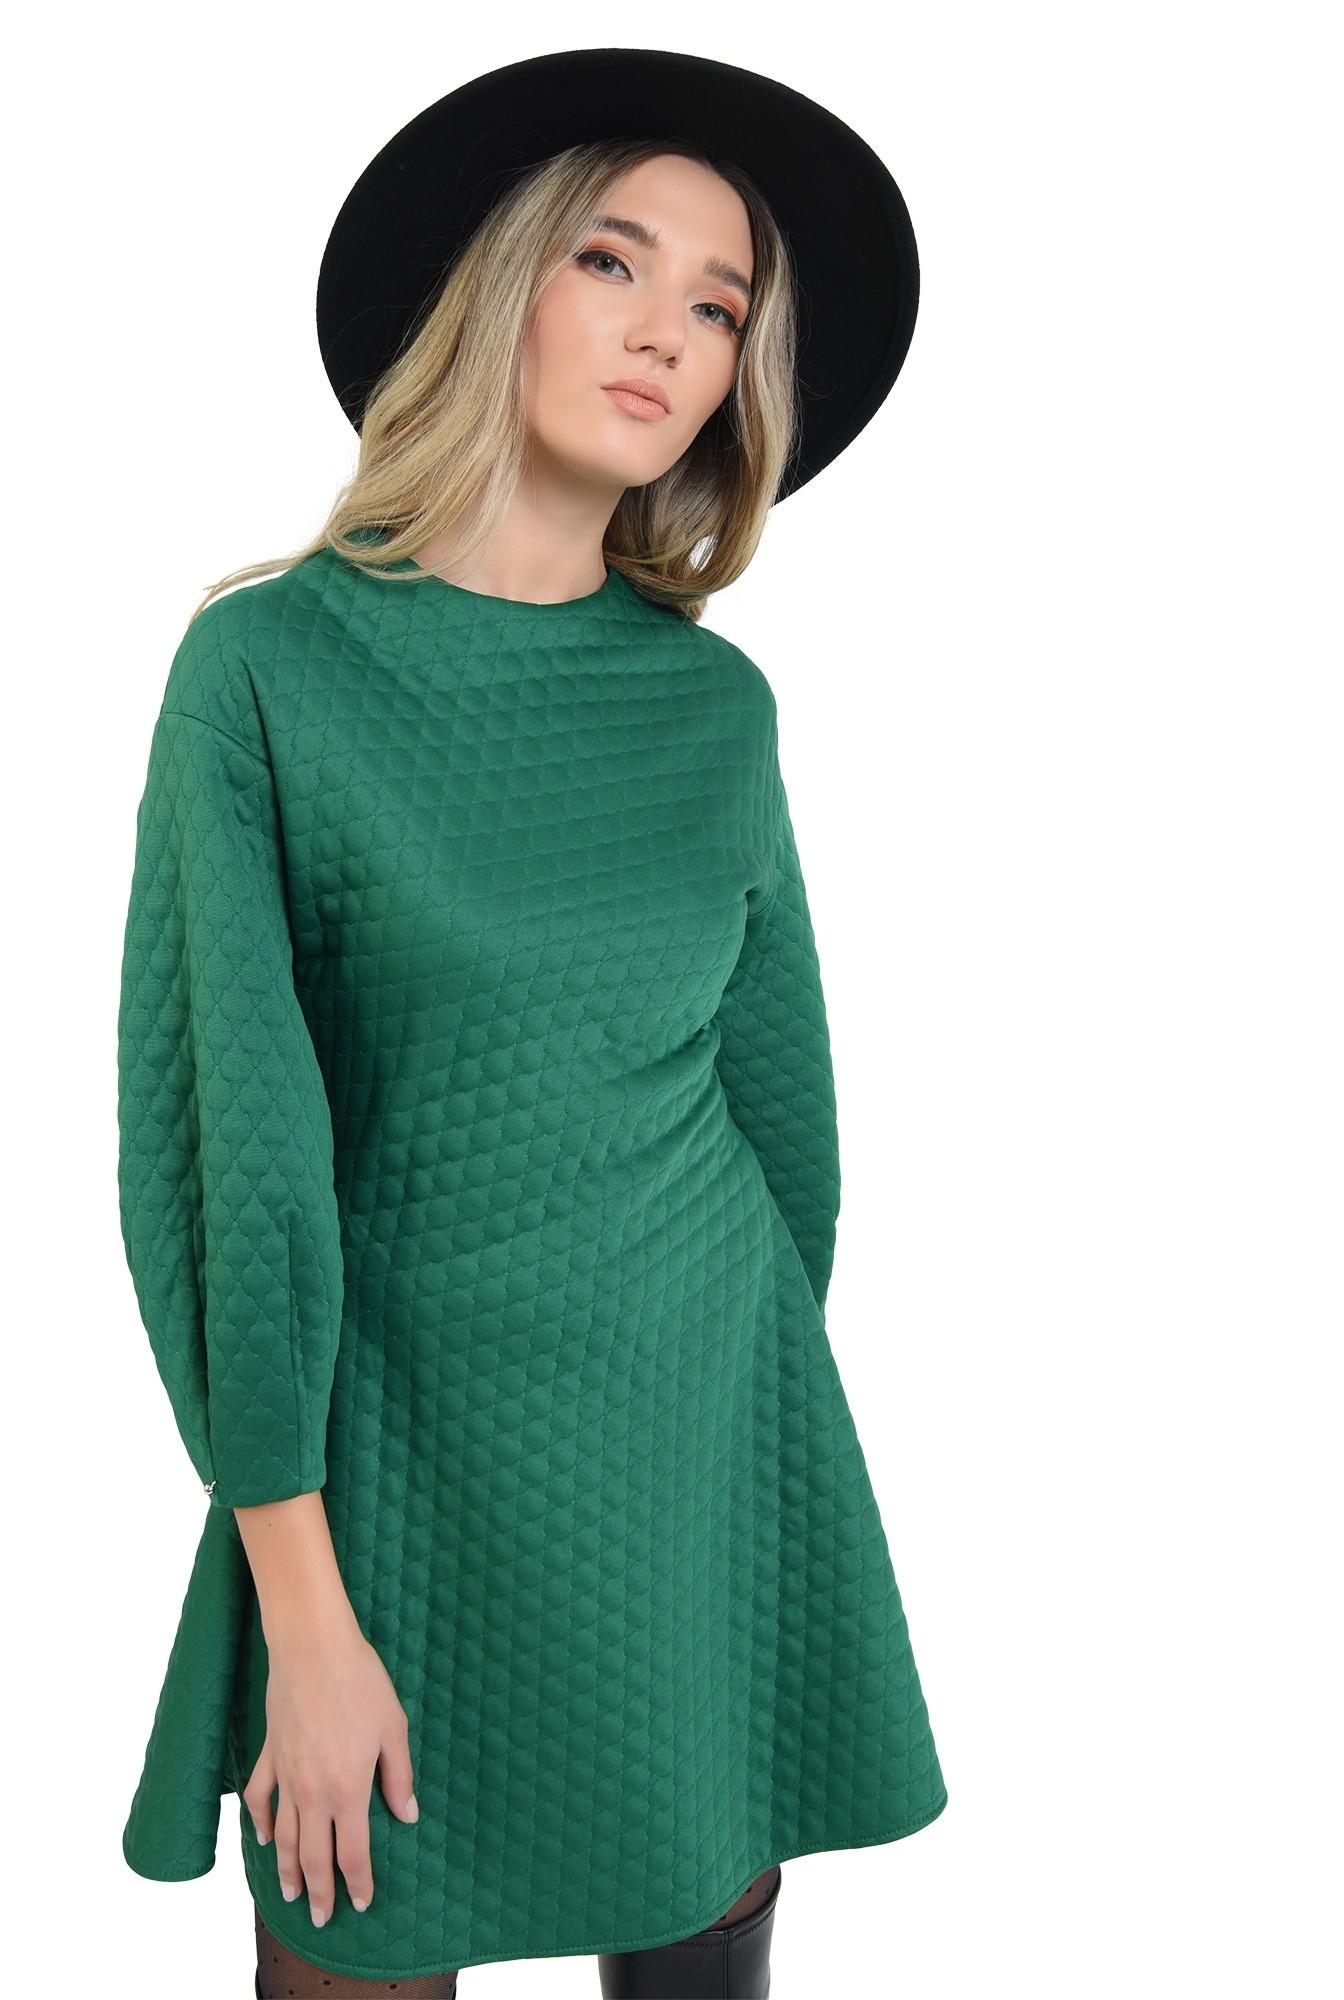 rochie din material matlasat, verde, scurta, evazata